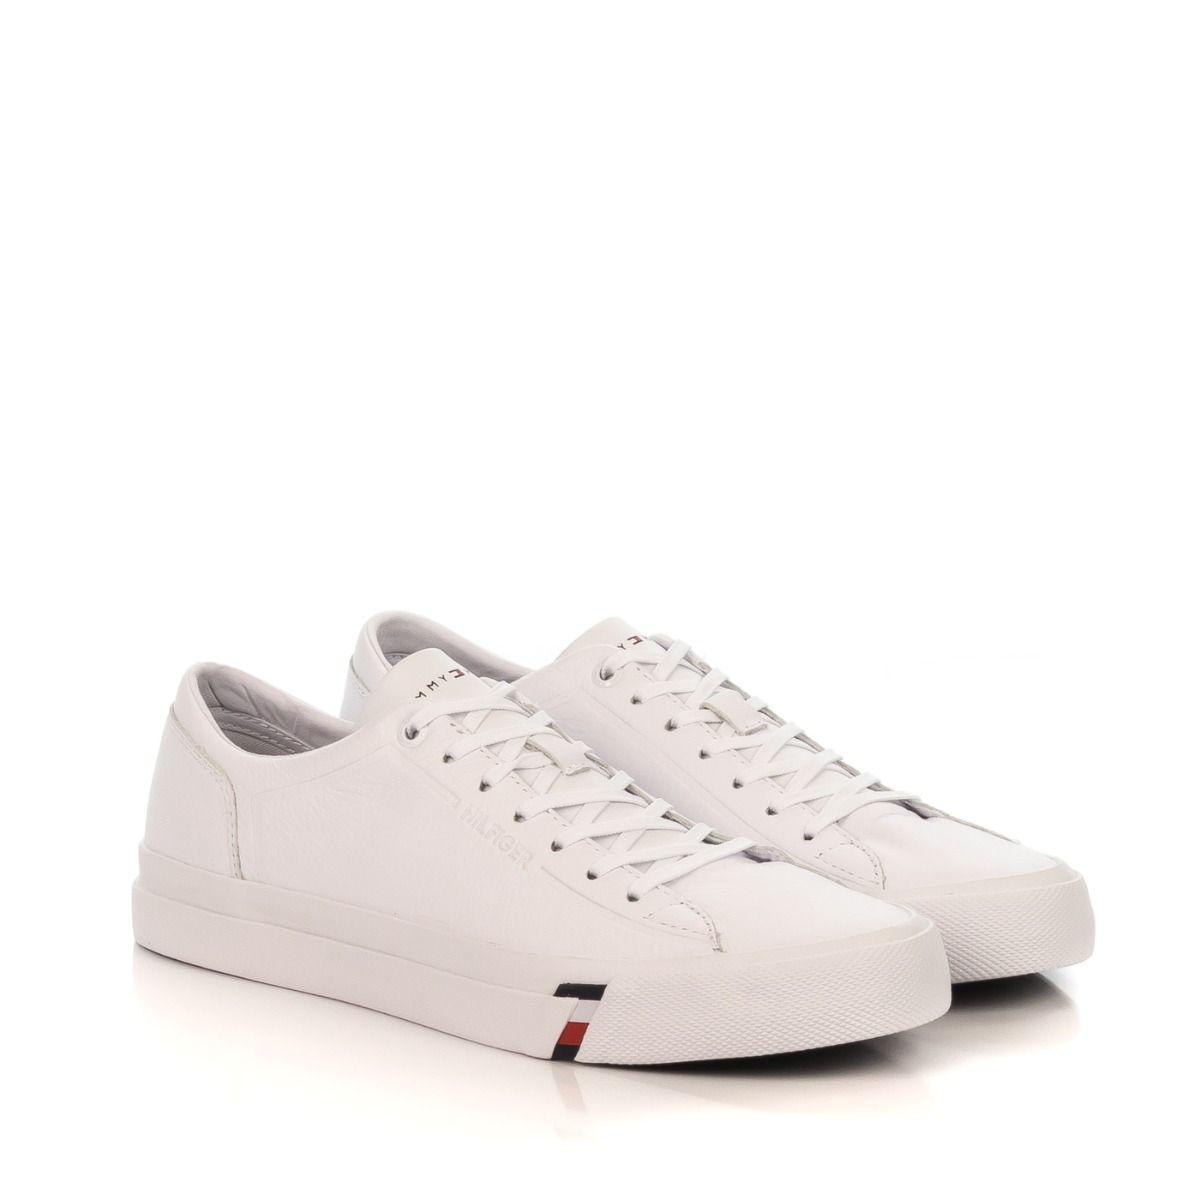 Sneakers uomo|TOMMY HILFIGER 2089 100 DINO in pelle bianca